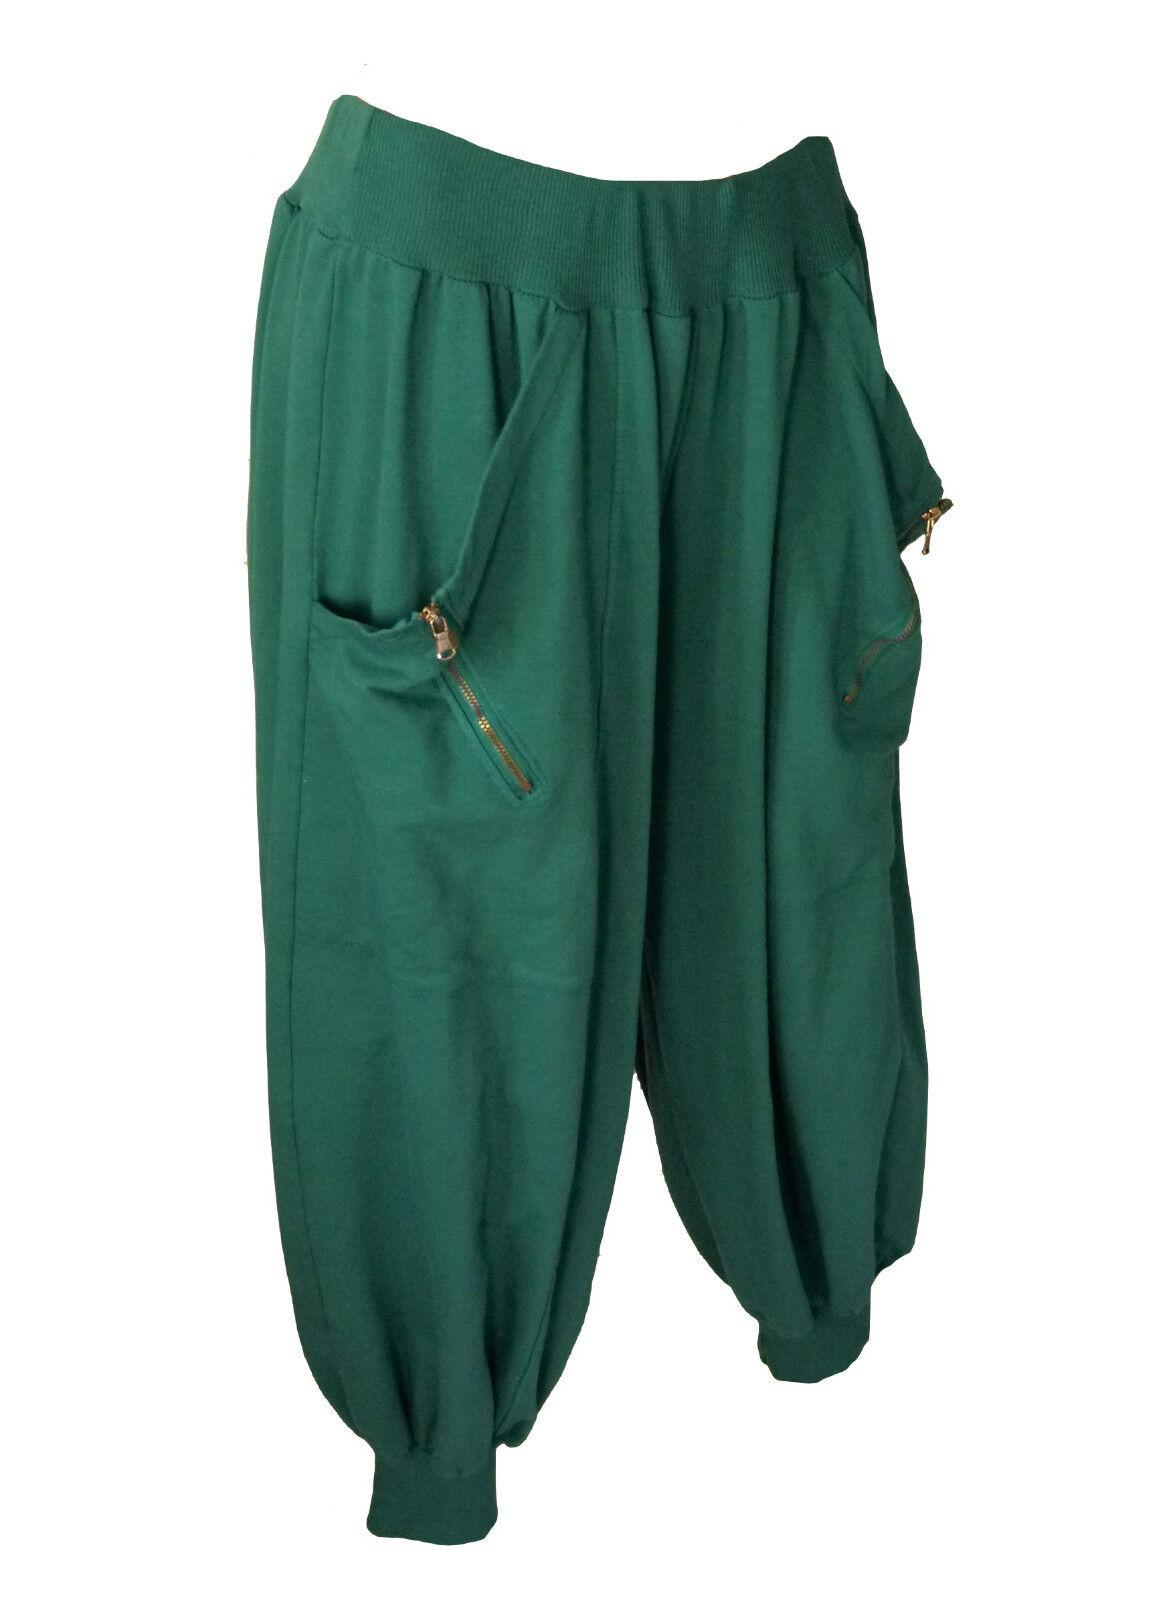 TG. 46 48 48 50 50 52 Pantaloni Pantaloni Pantaloni ALBERO wollhose Sweathose palloncino Pantaloni Mega lontano Lagenlook 8946f3